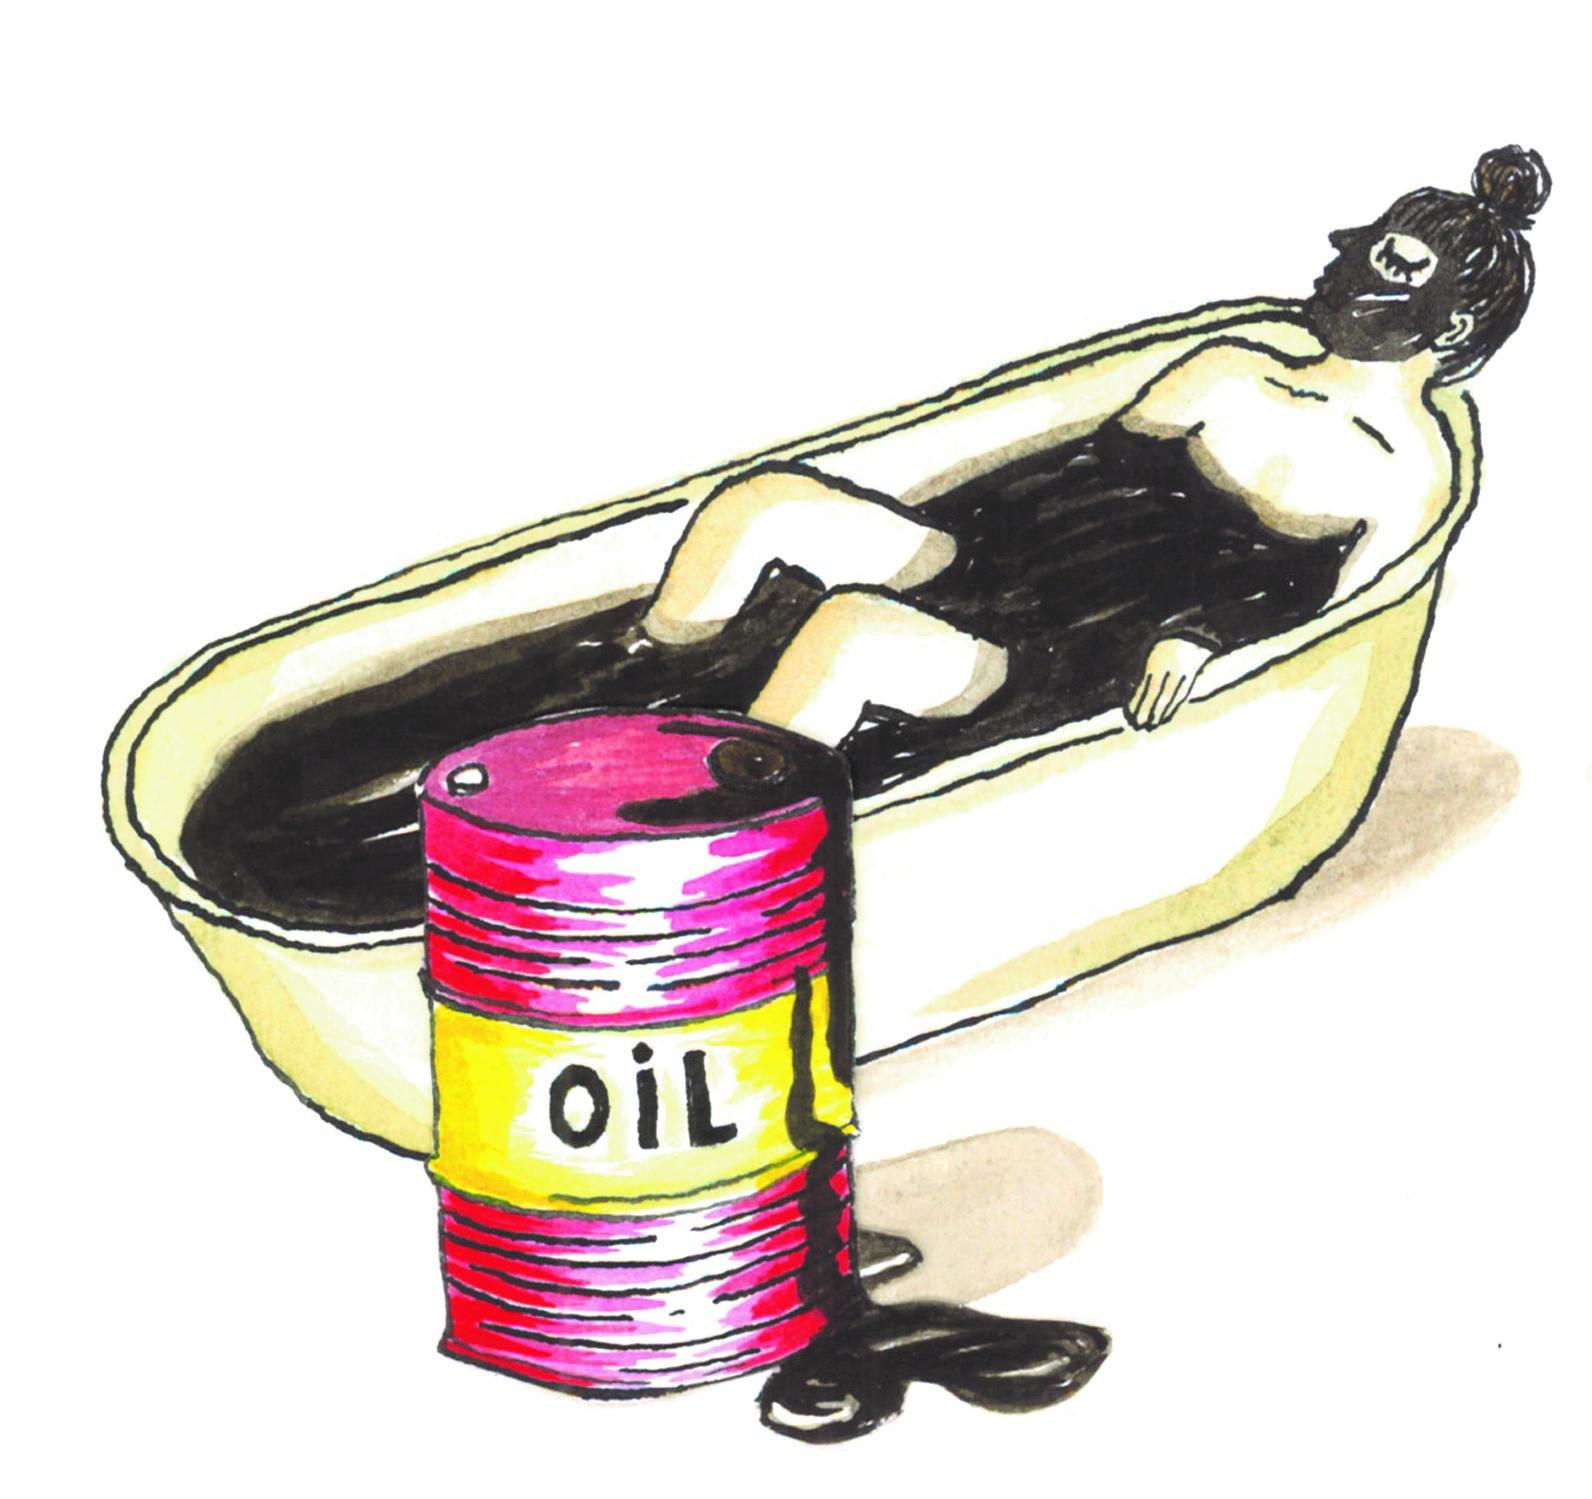 oilbath